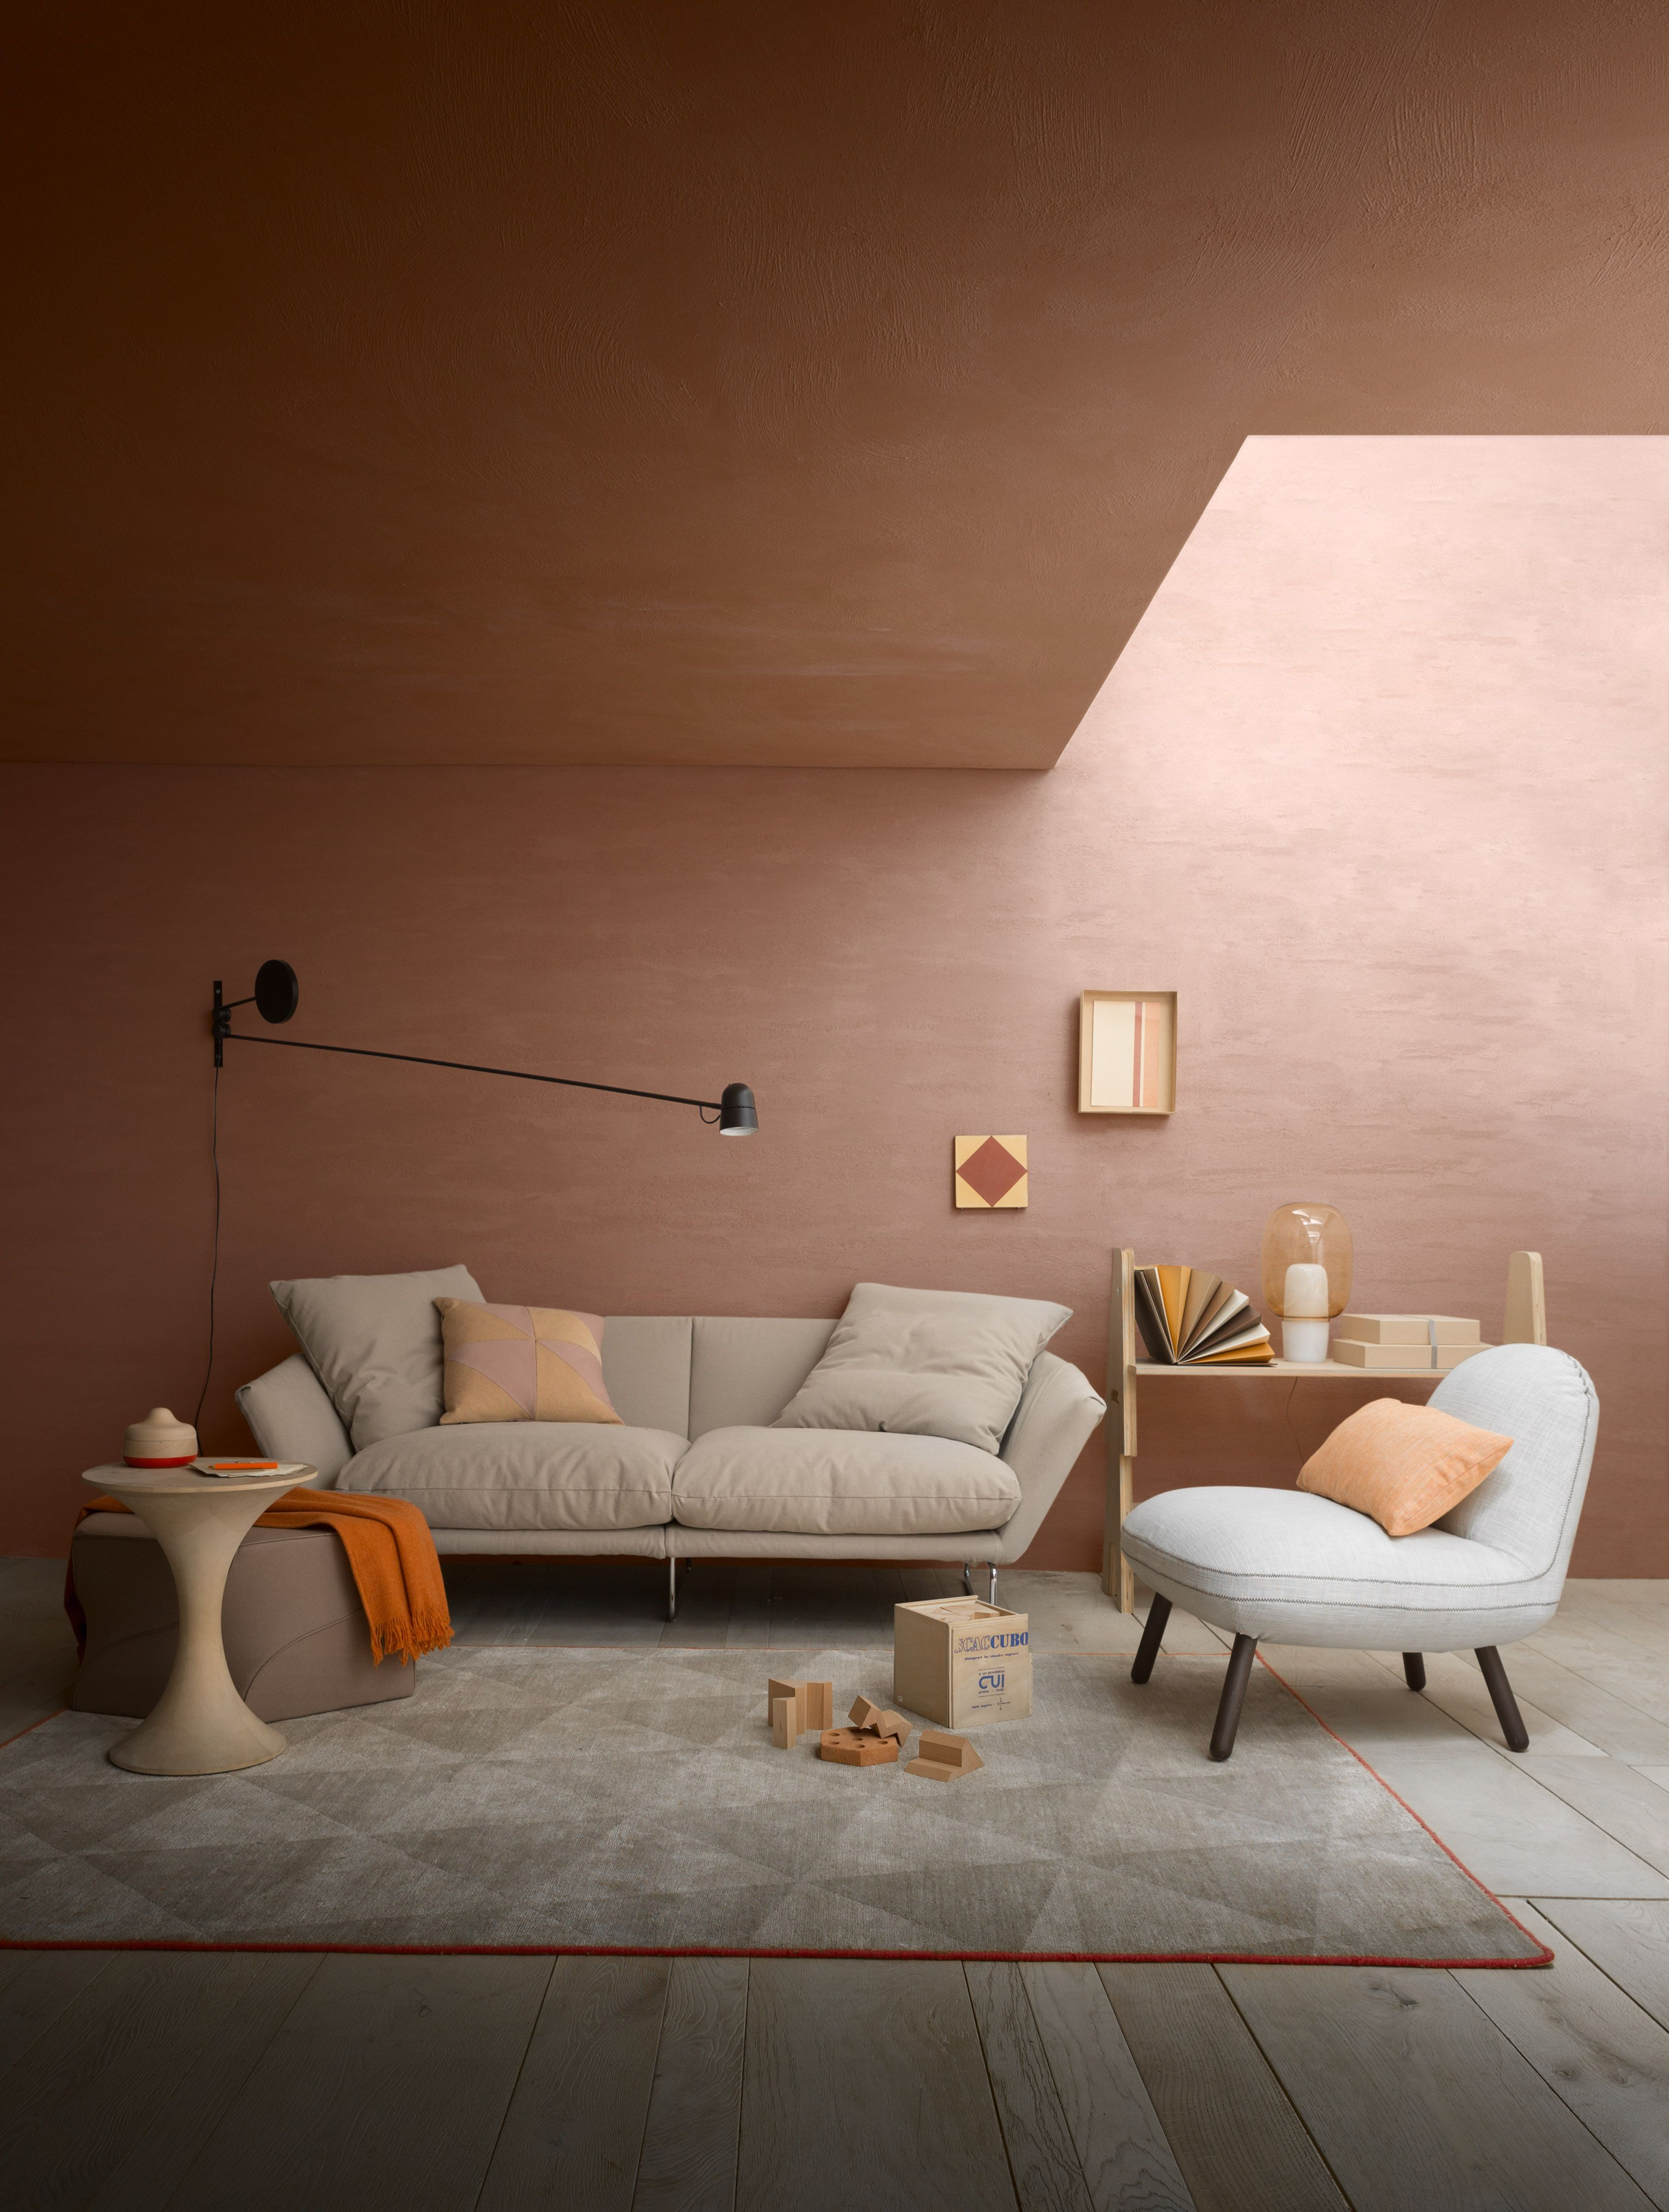 Home interior colors orange home  hearst  styling alessandra salaris photo beppe brancato